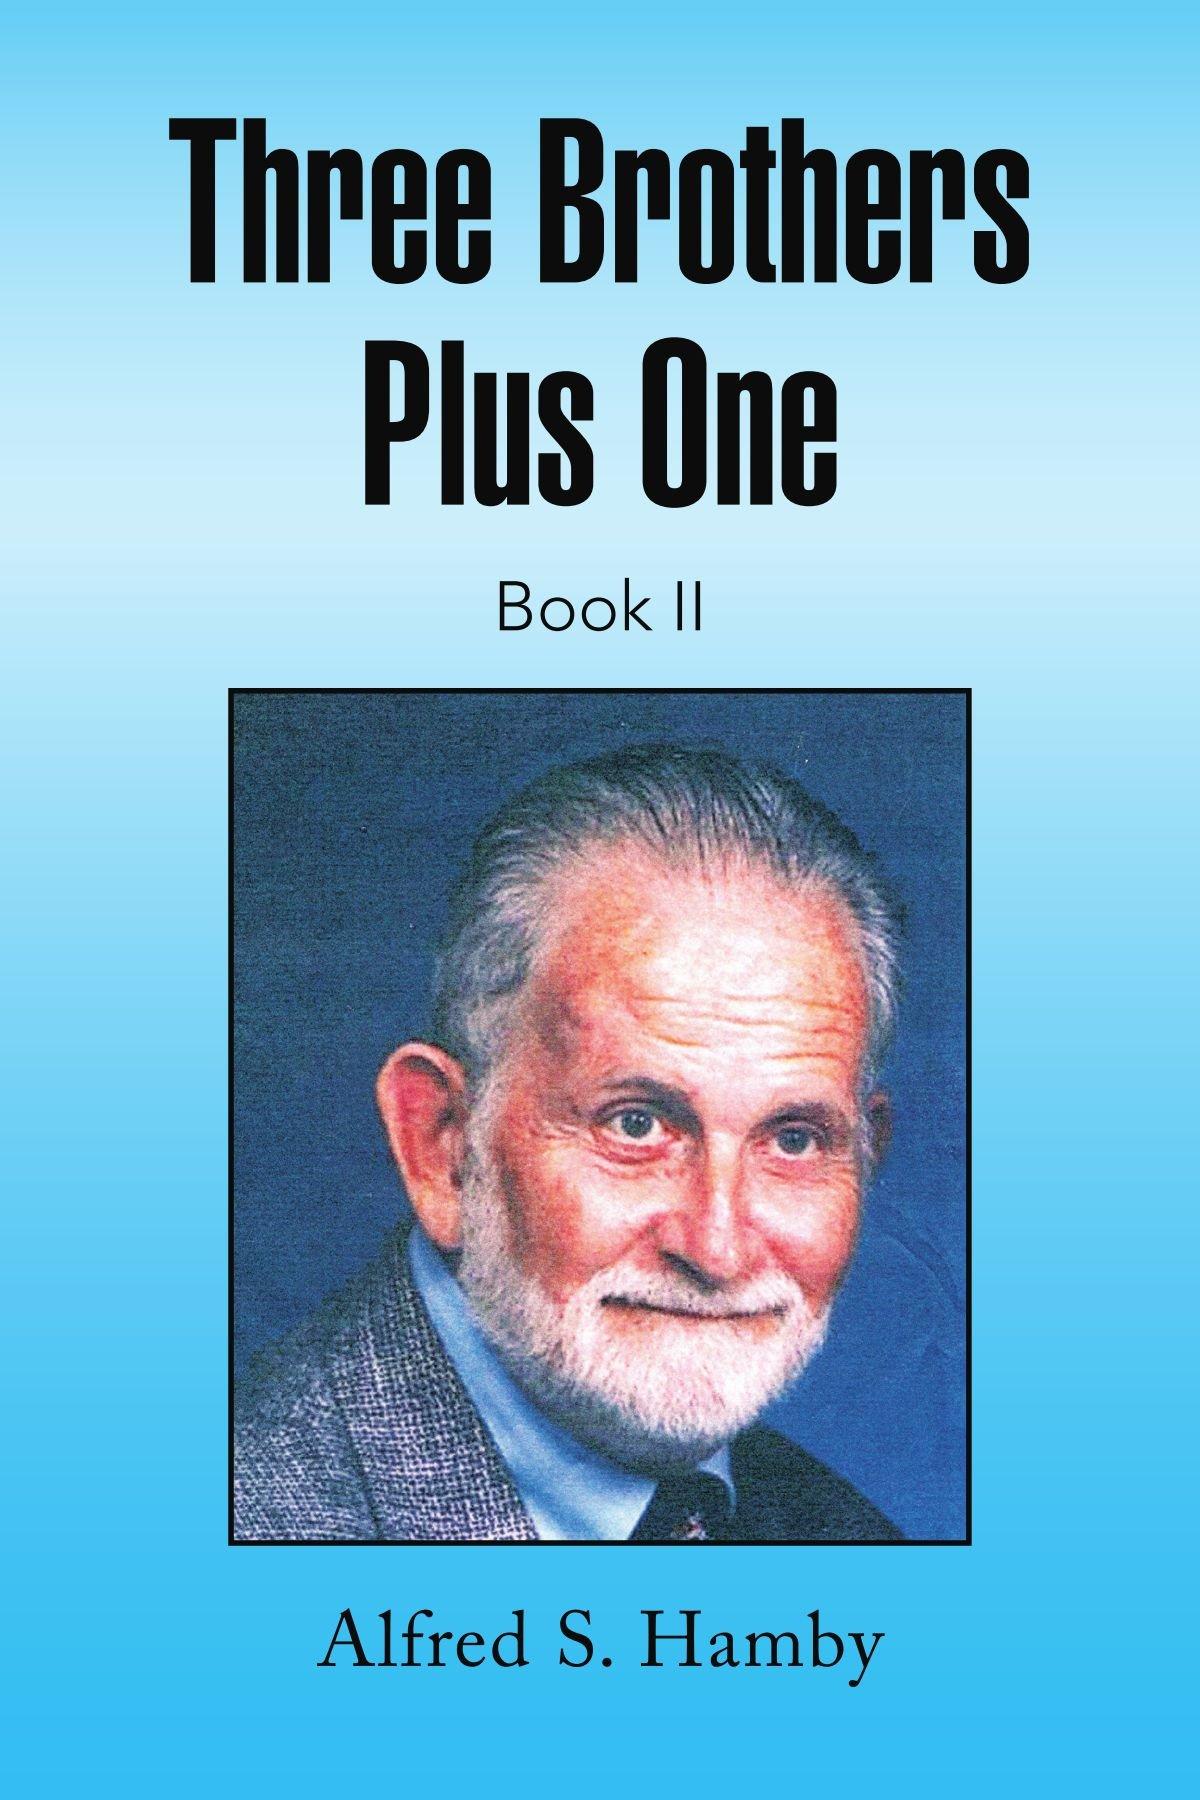 Read Online Three Brothers Plus One Book II PDF